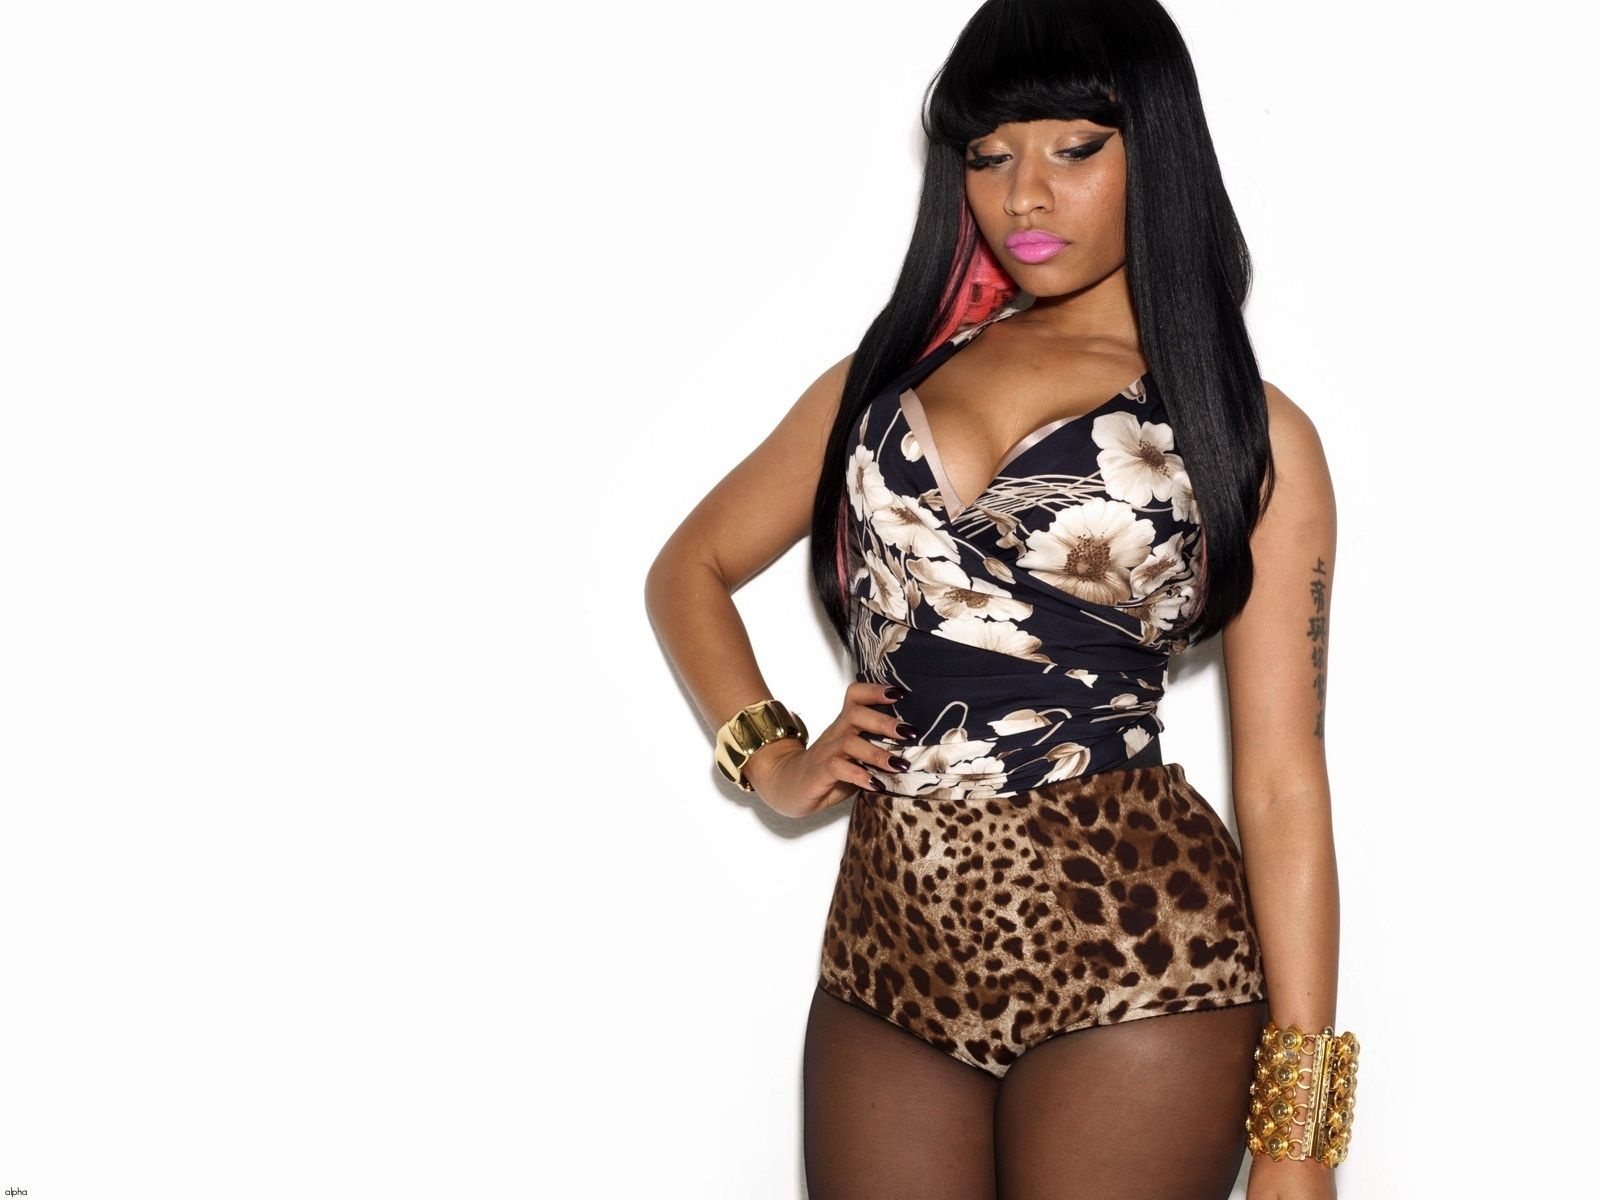 N M In 2019 Nicki Minaj Starships Nicki Minaj Wallpaper